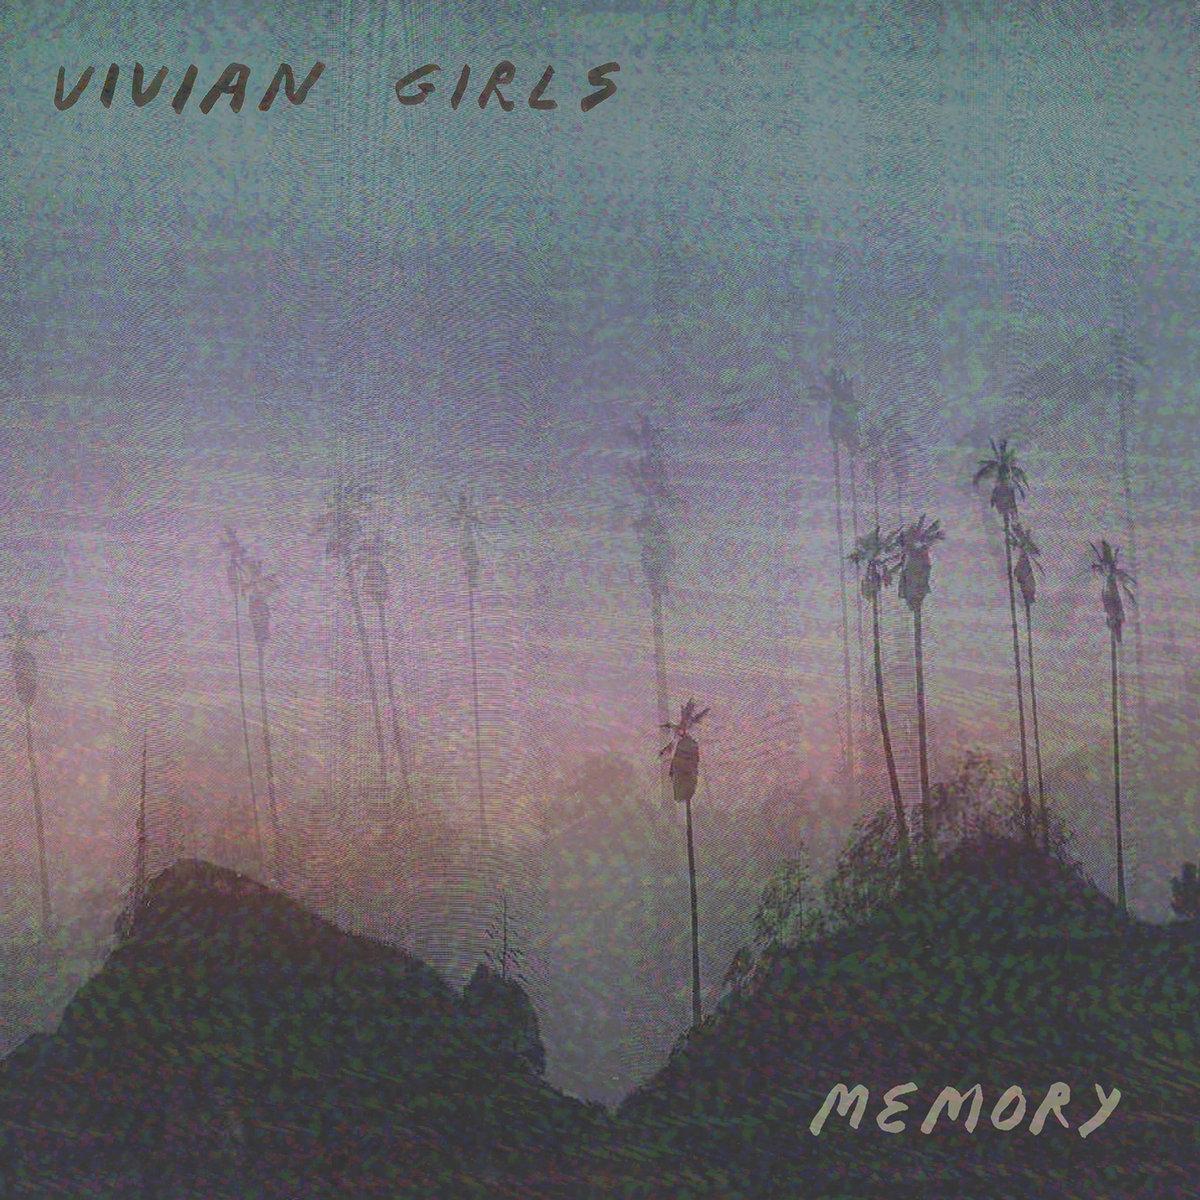 Image result for vivian girls memory